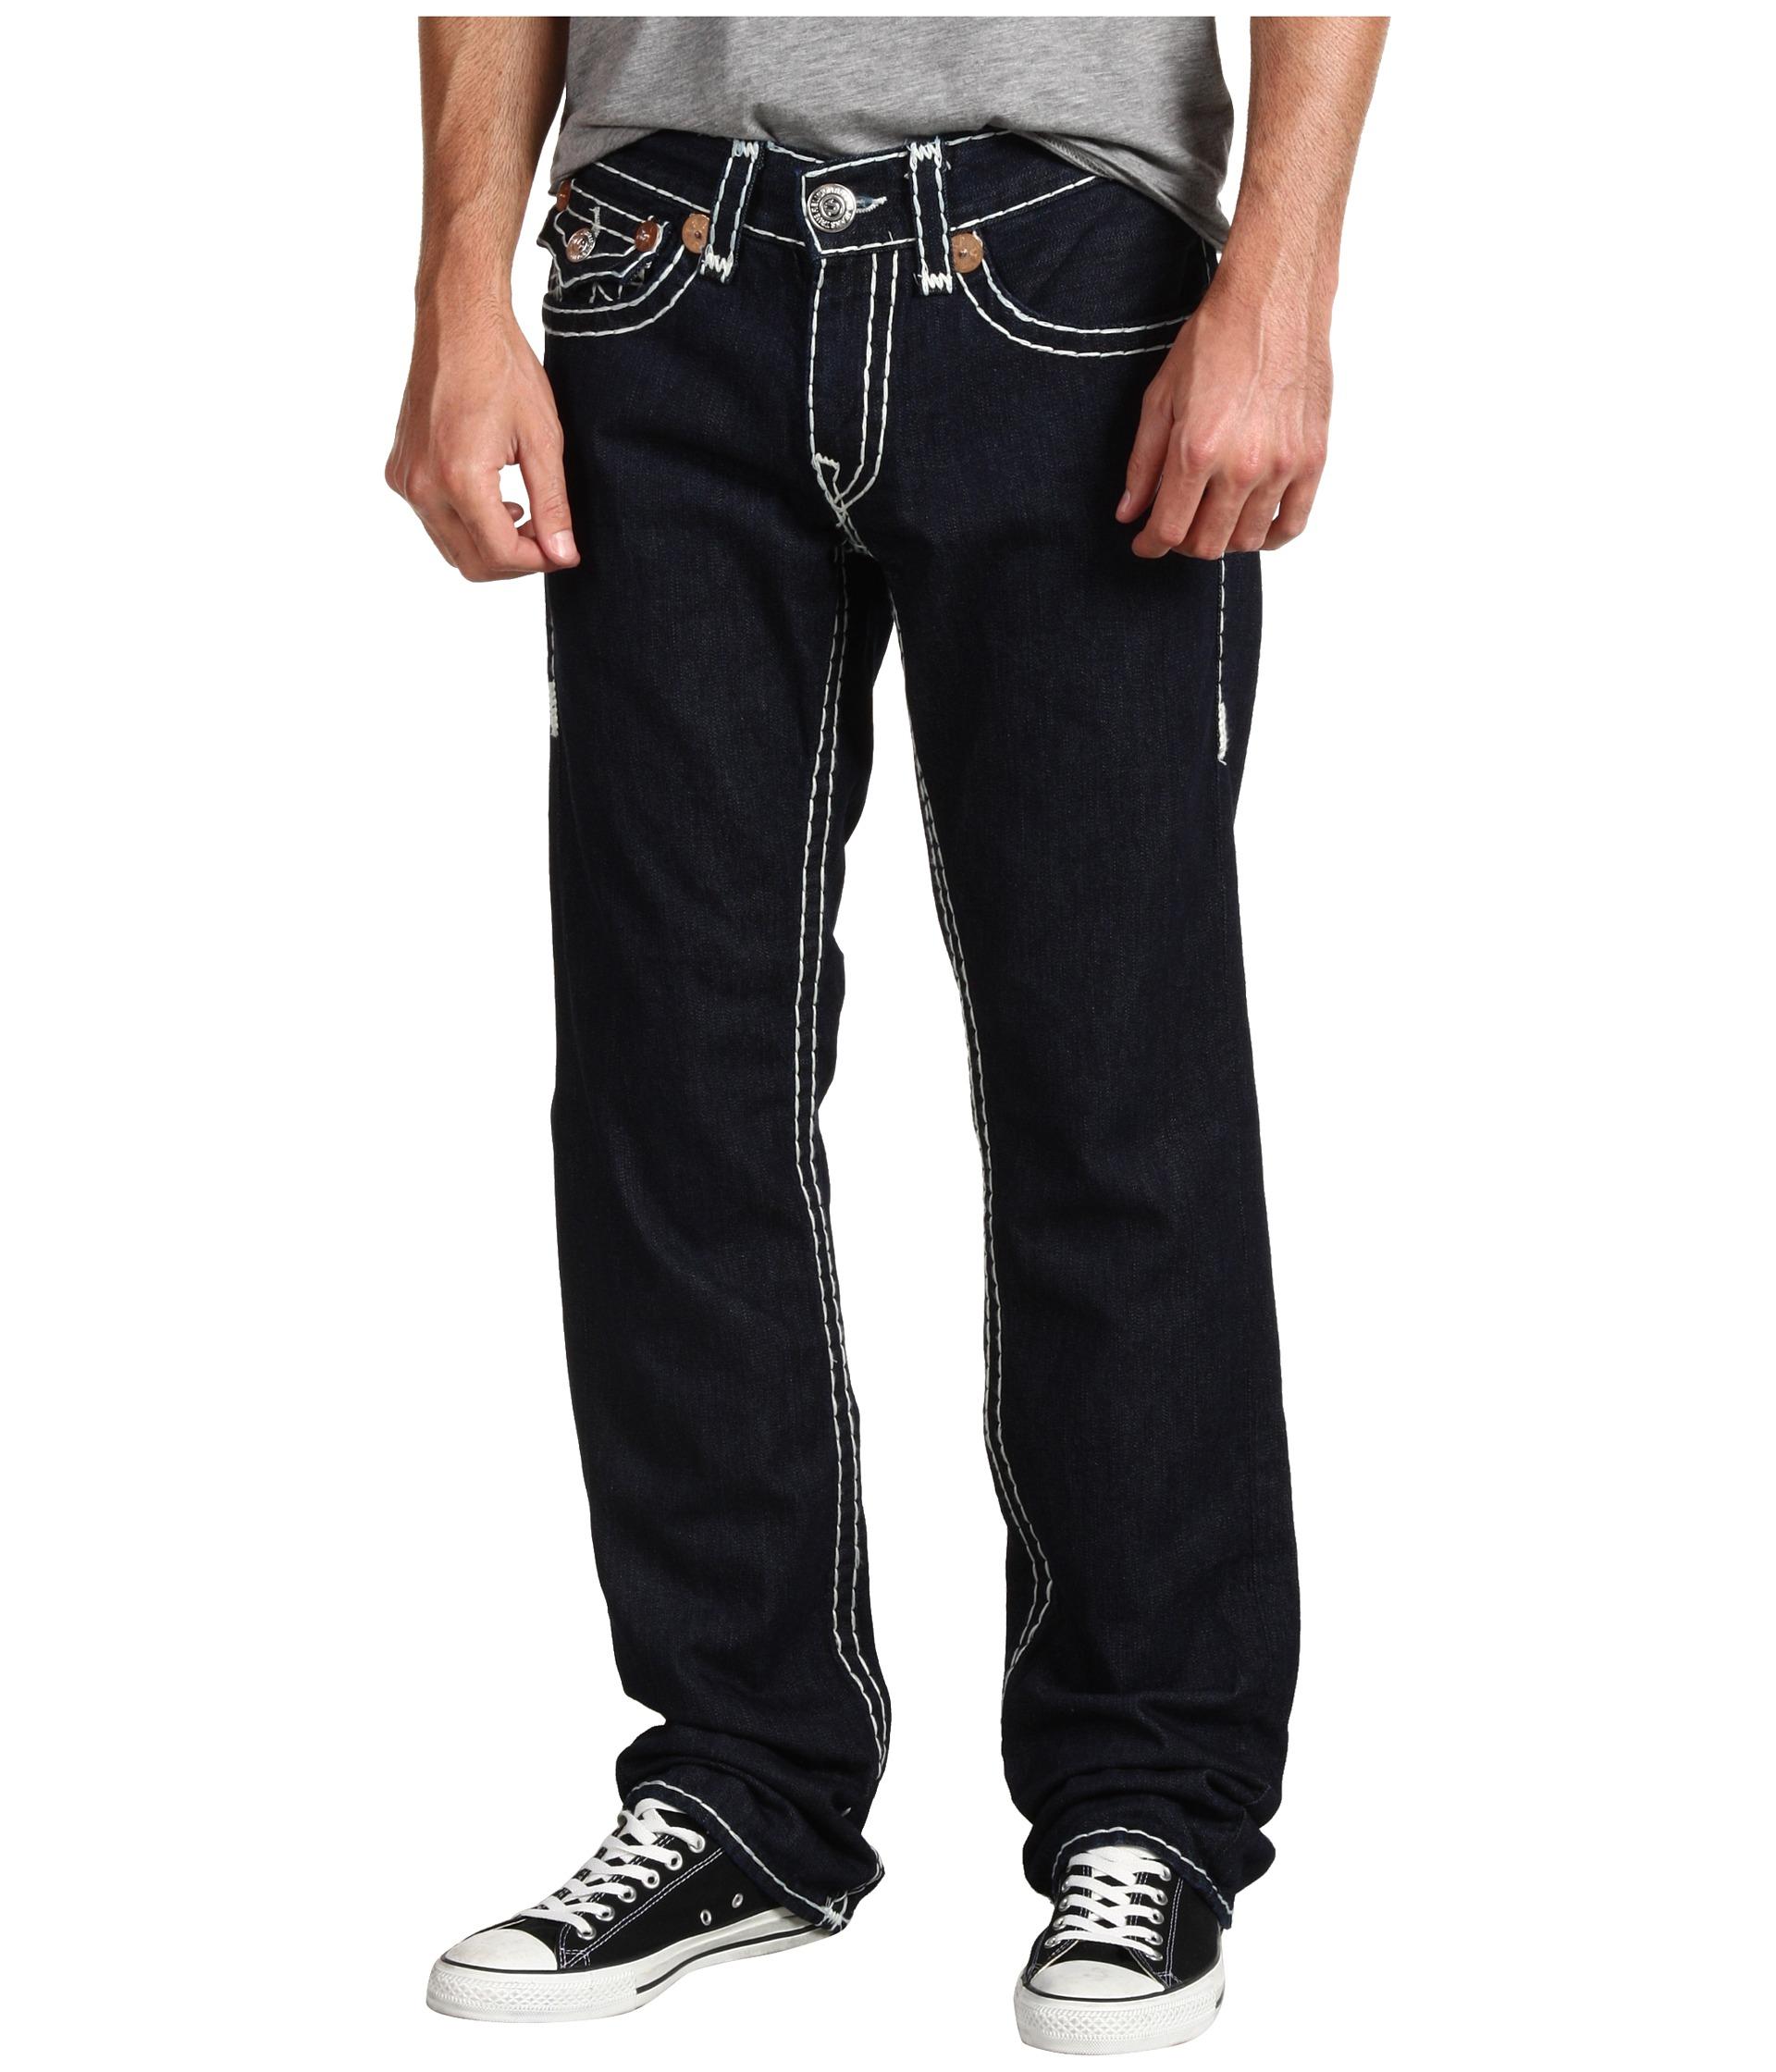 0c8ad55a True Religion Ricky Straight Super T in Body Rinse in Black for Men ...